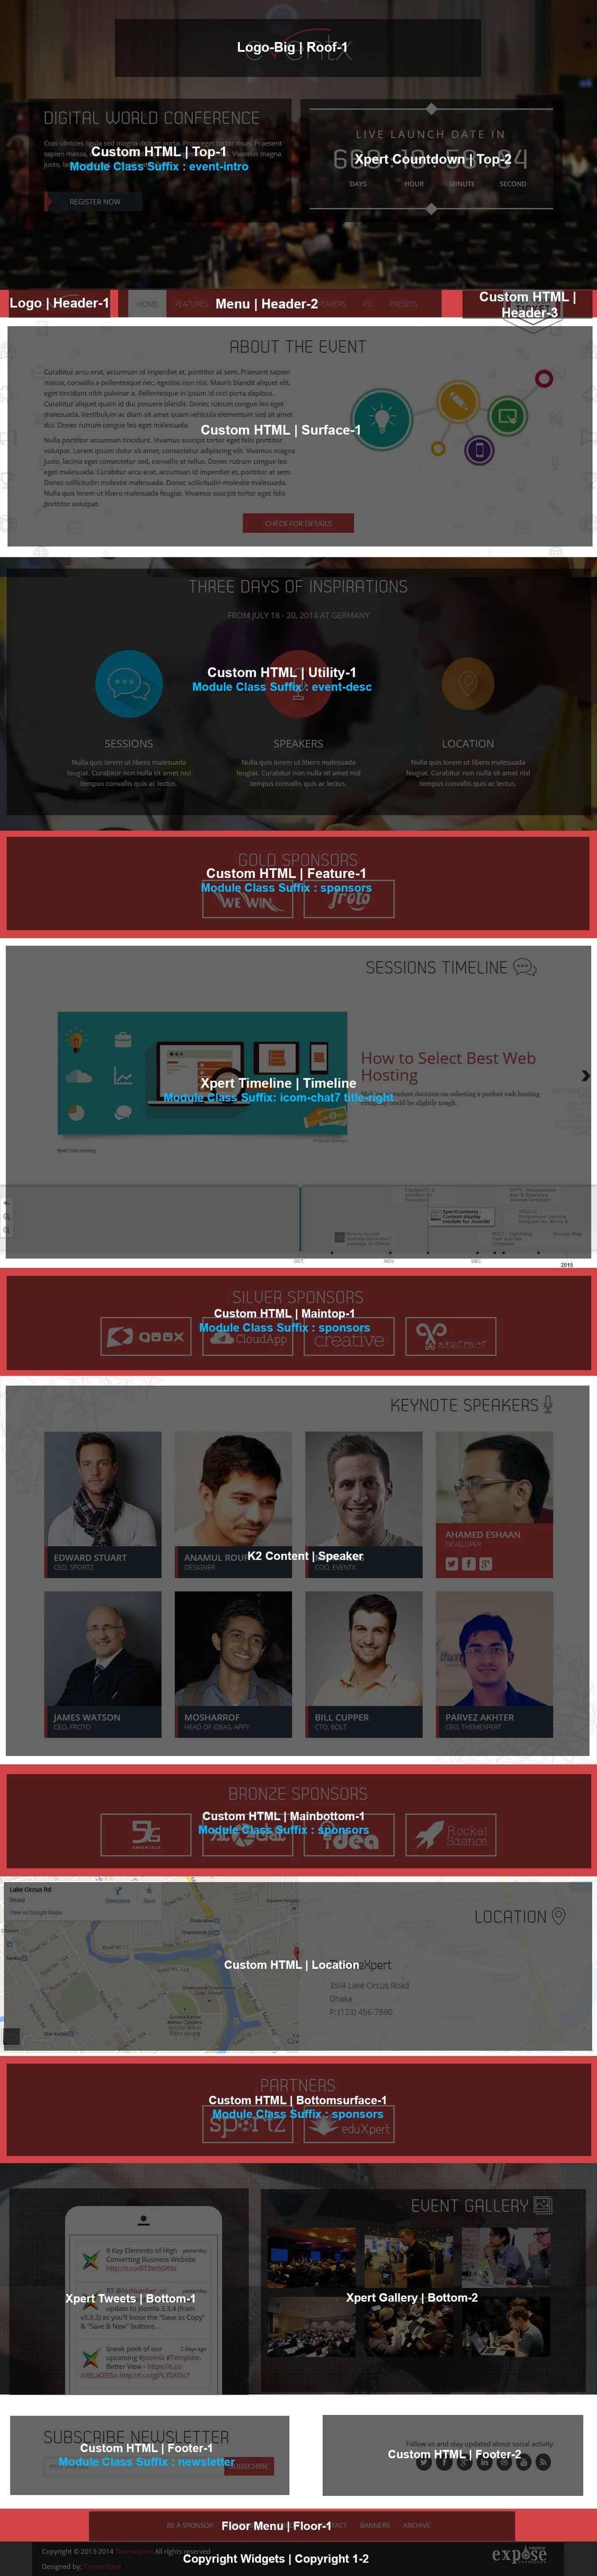 EventX Homepage